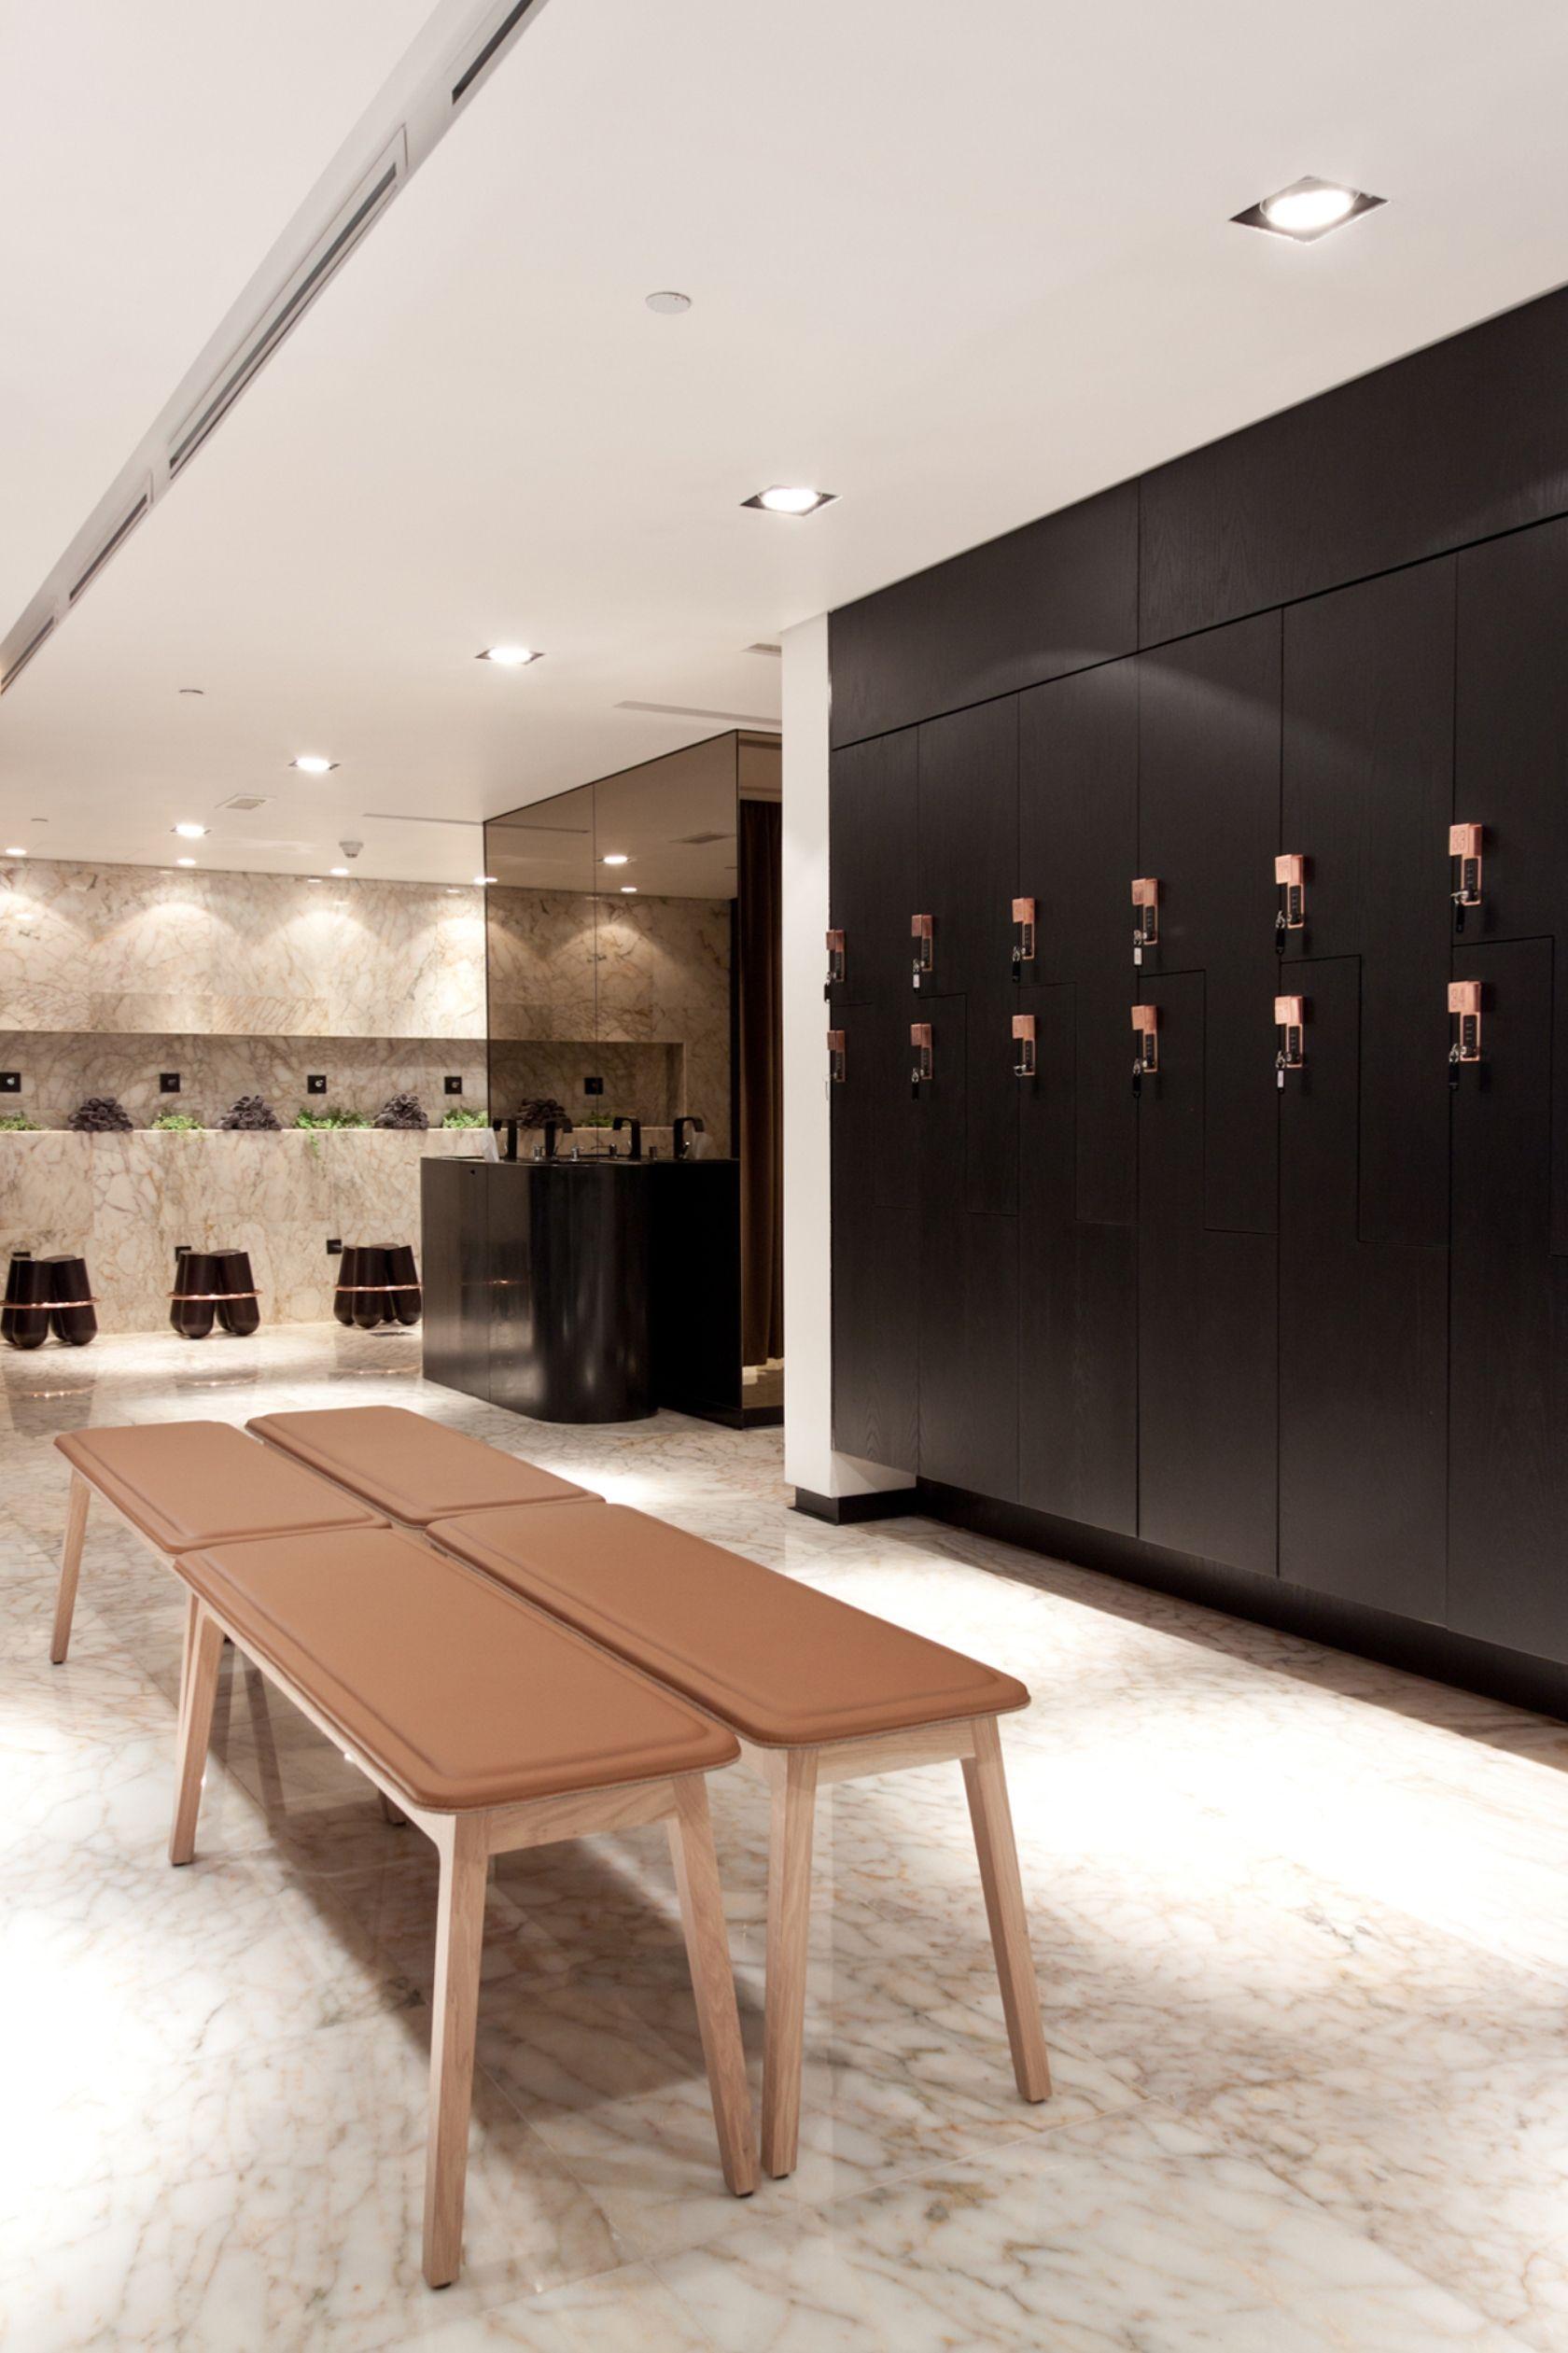 Luxury Locker Room Design | The Yoga Center in 2019 | Gym ...